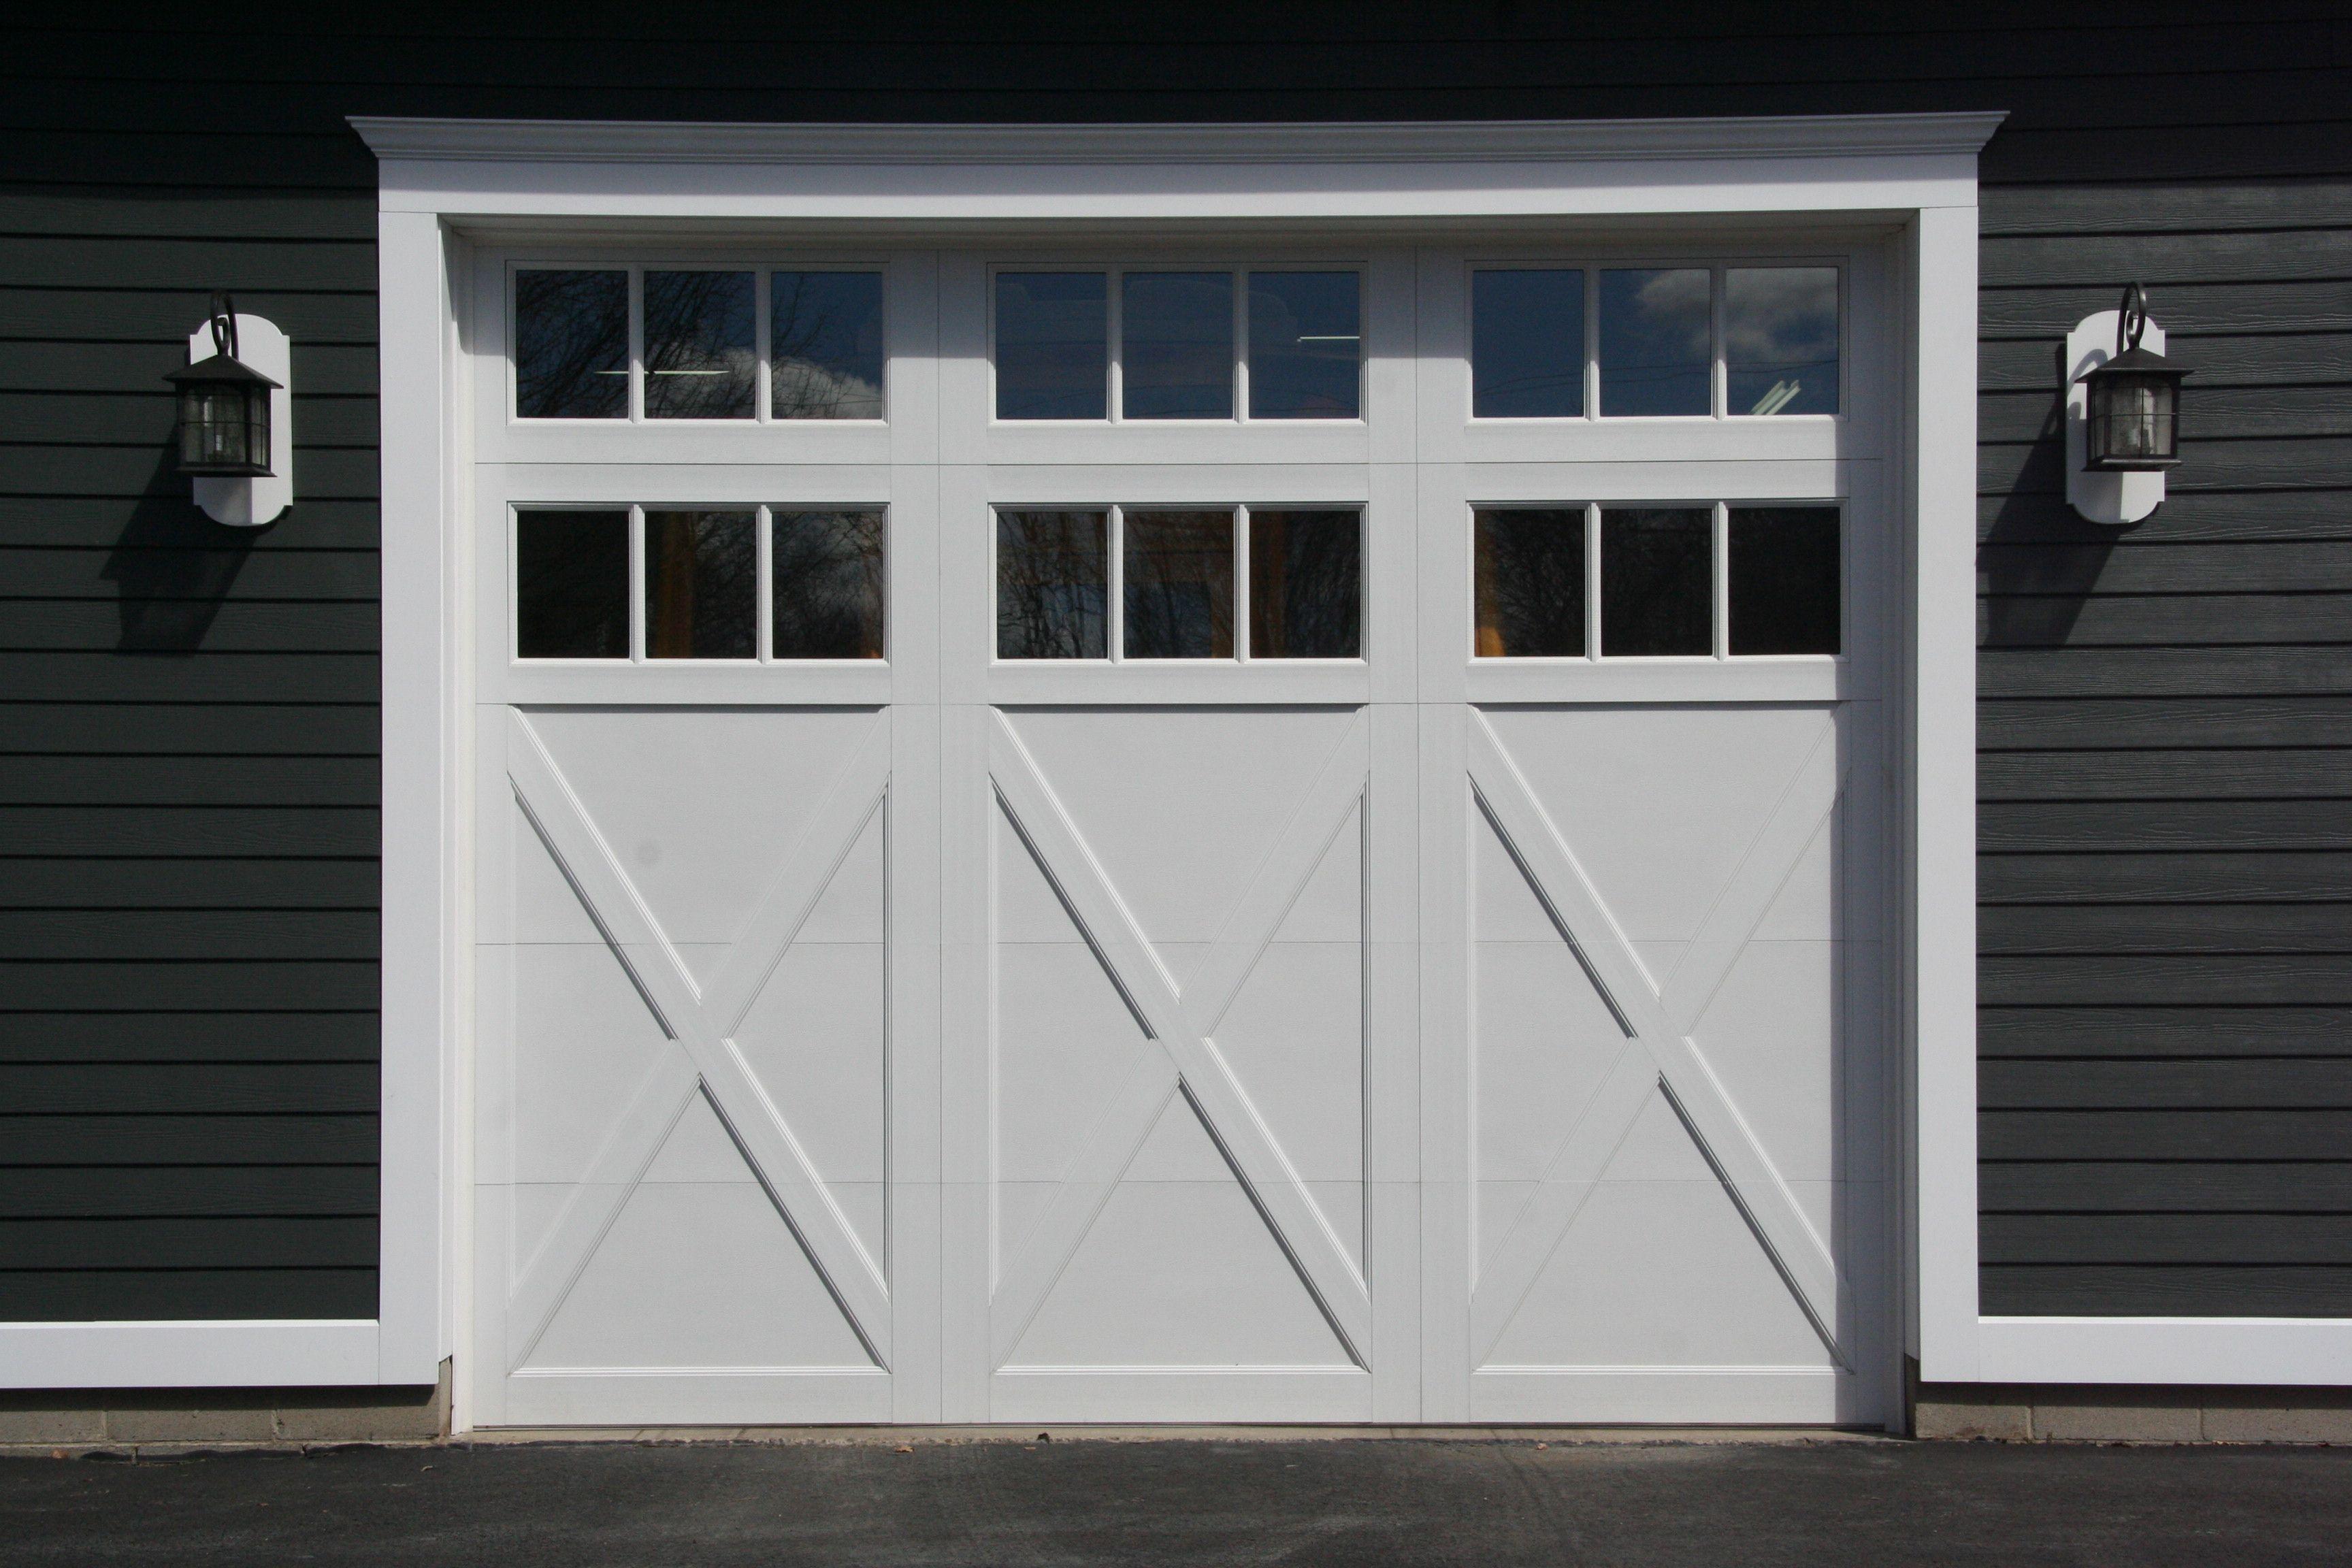 Lovely Raynor Garage Doors Rockcreeke Model With Two Rows Of Windows. Dutchess  Overhead Doors, Poughkeepsie